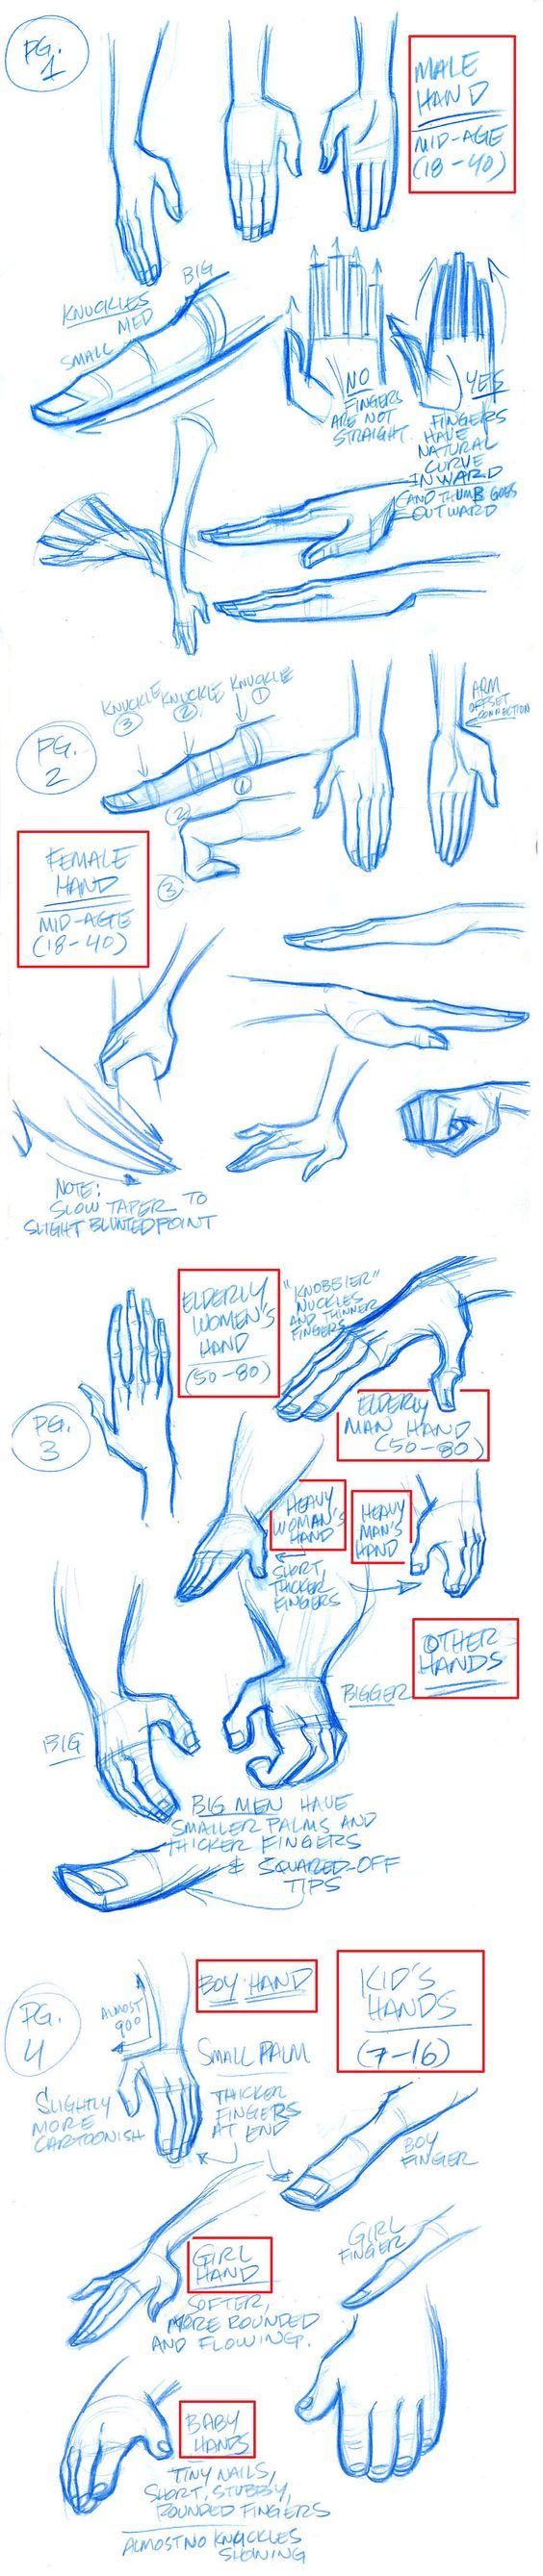 Stylized Hands model sheets by tombancroft on DeviantArt via cgpin.com